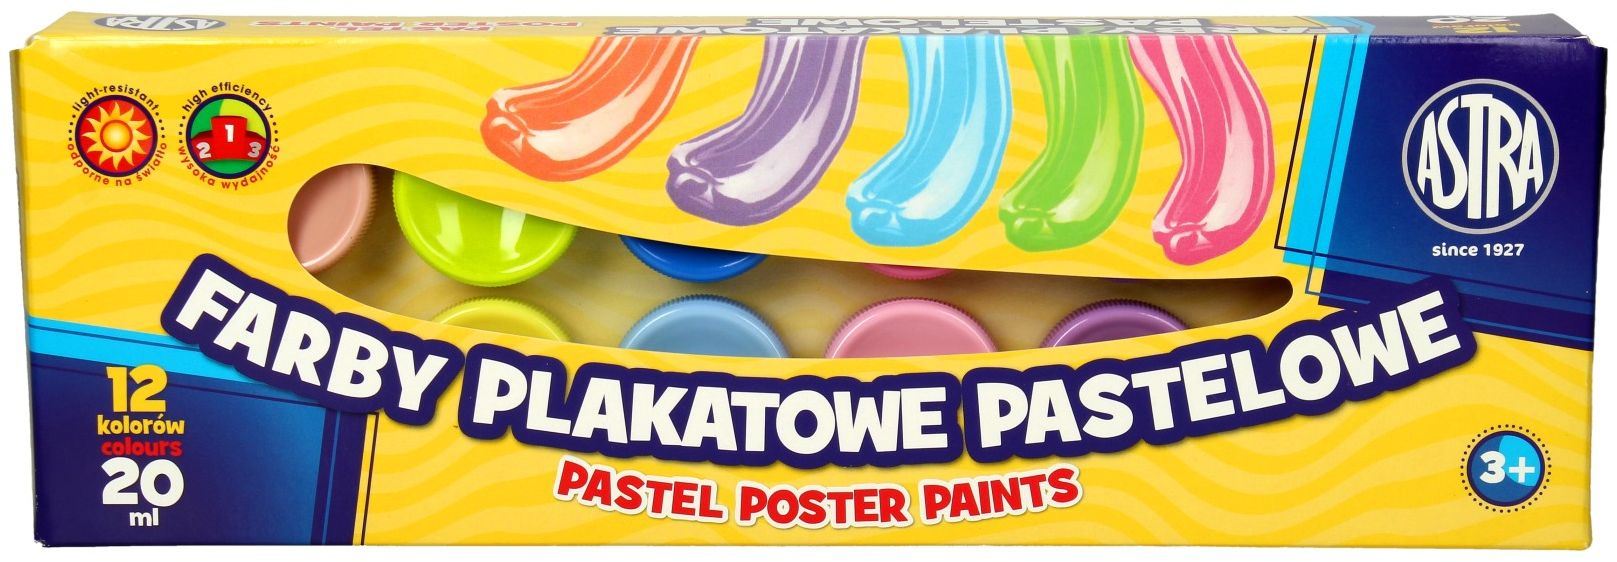 Farby plakatowe 12kol 20ml pastelowe Astra 301118001